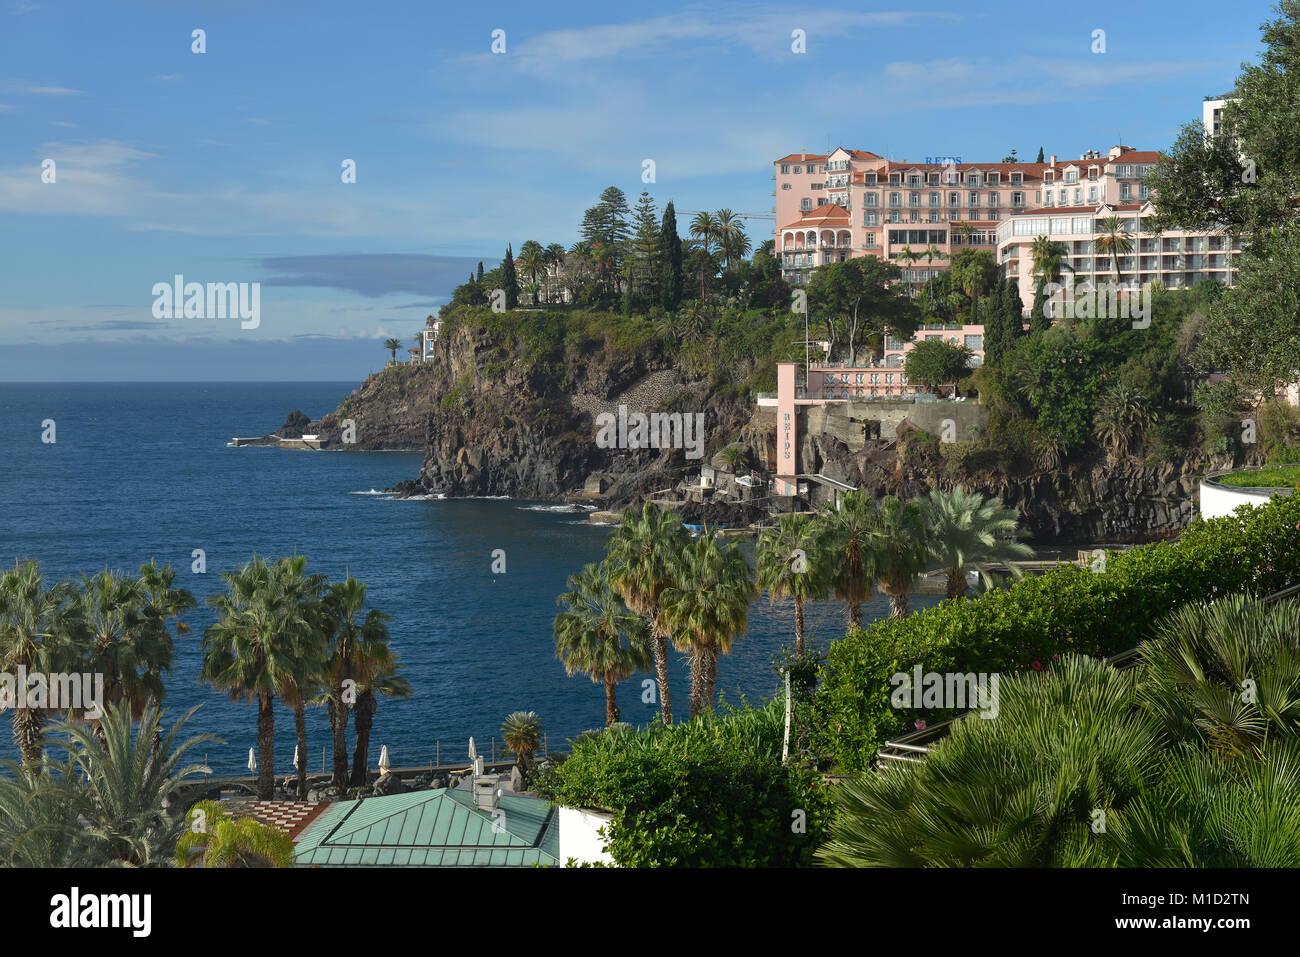 Reids Palace Hotel Funchal